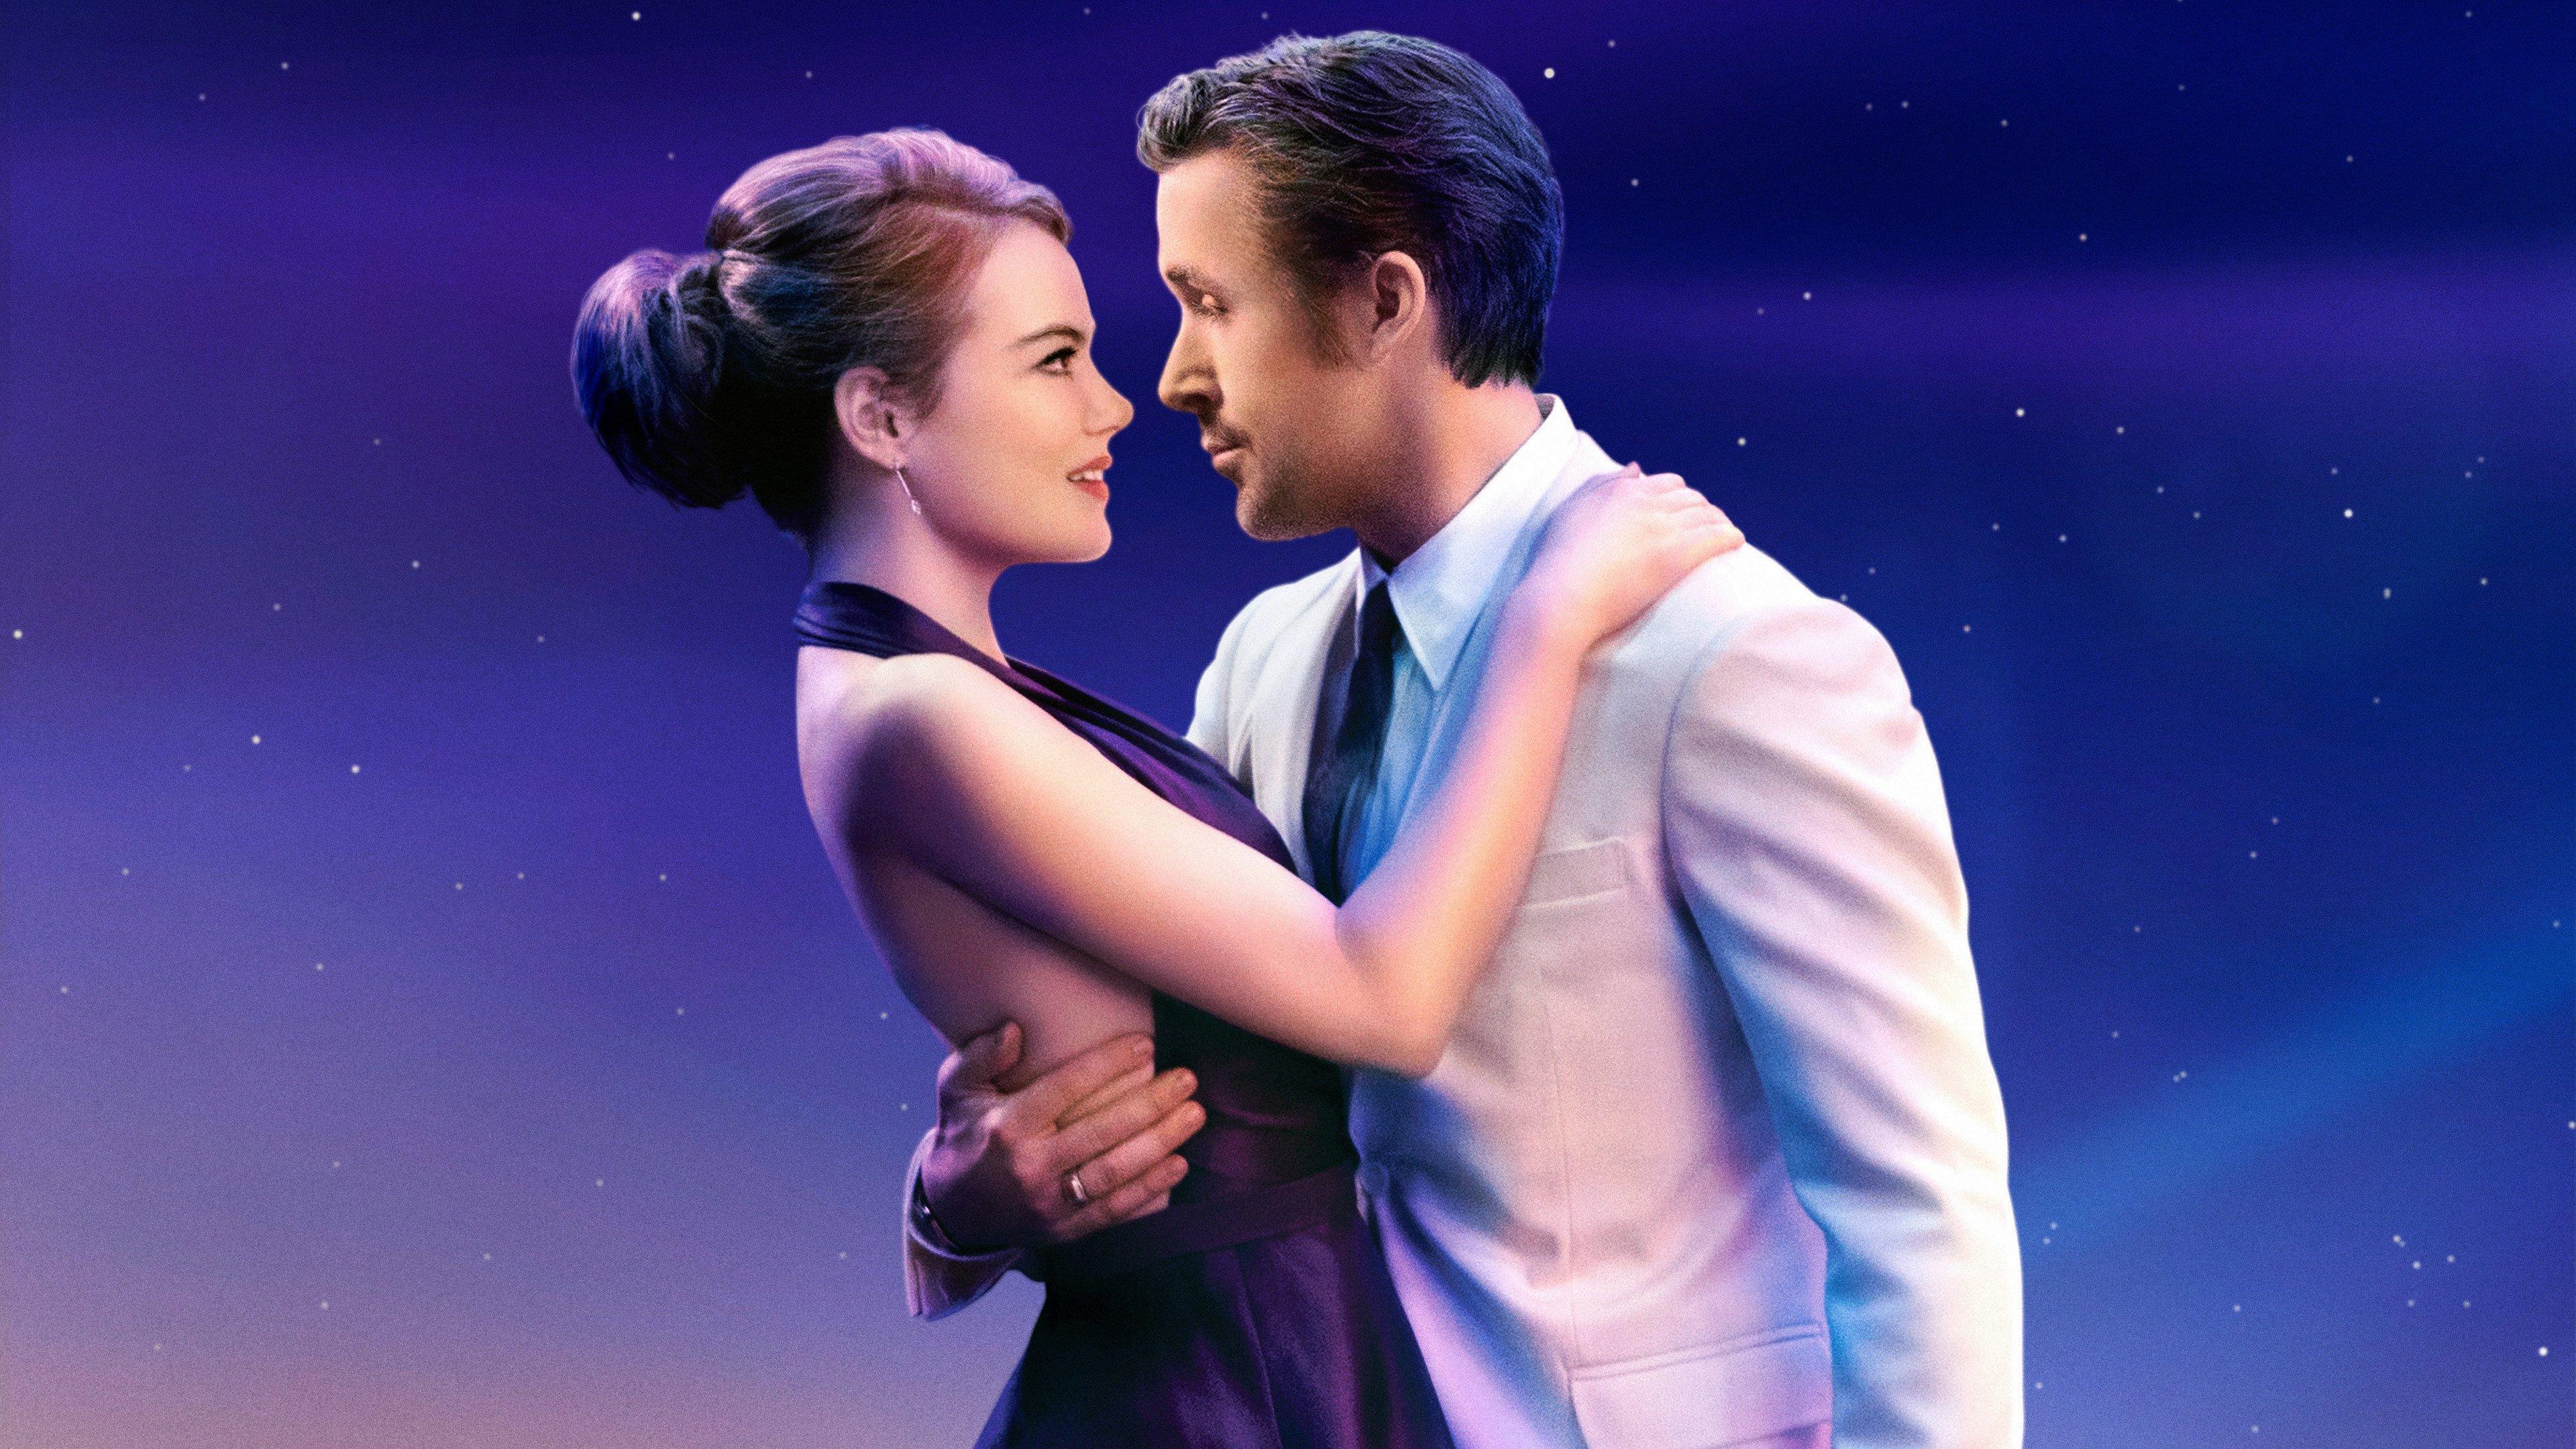 La La Land Hd Hd Movies 4k Wallpapers Images Backgrounds